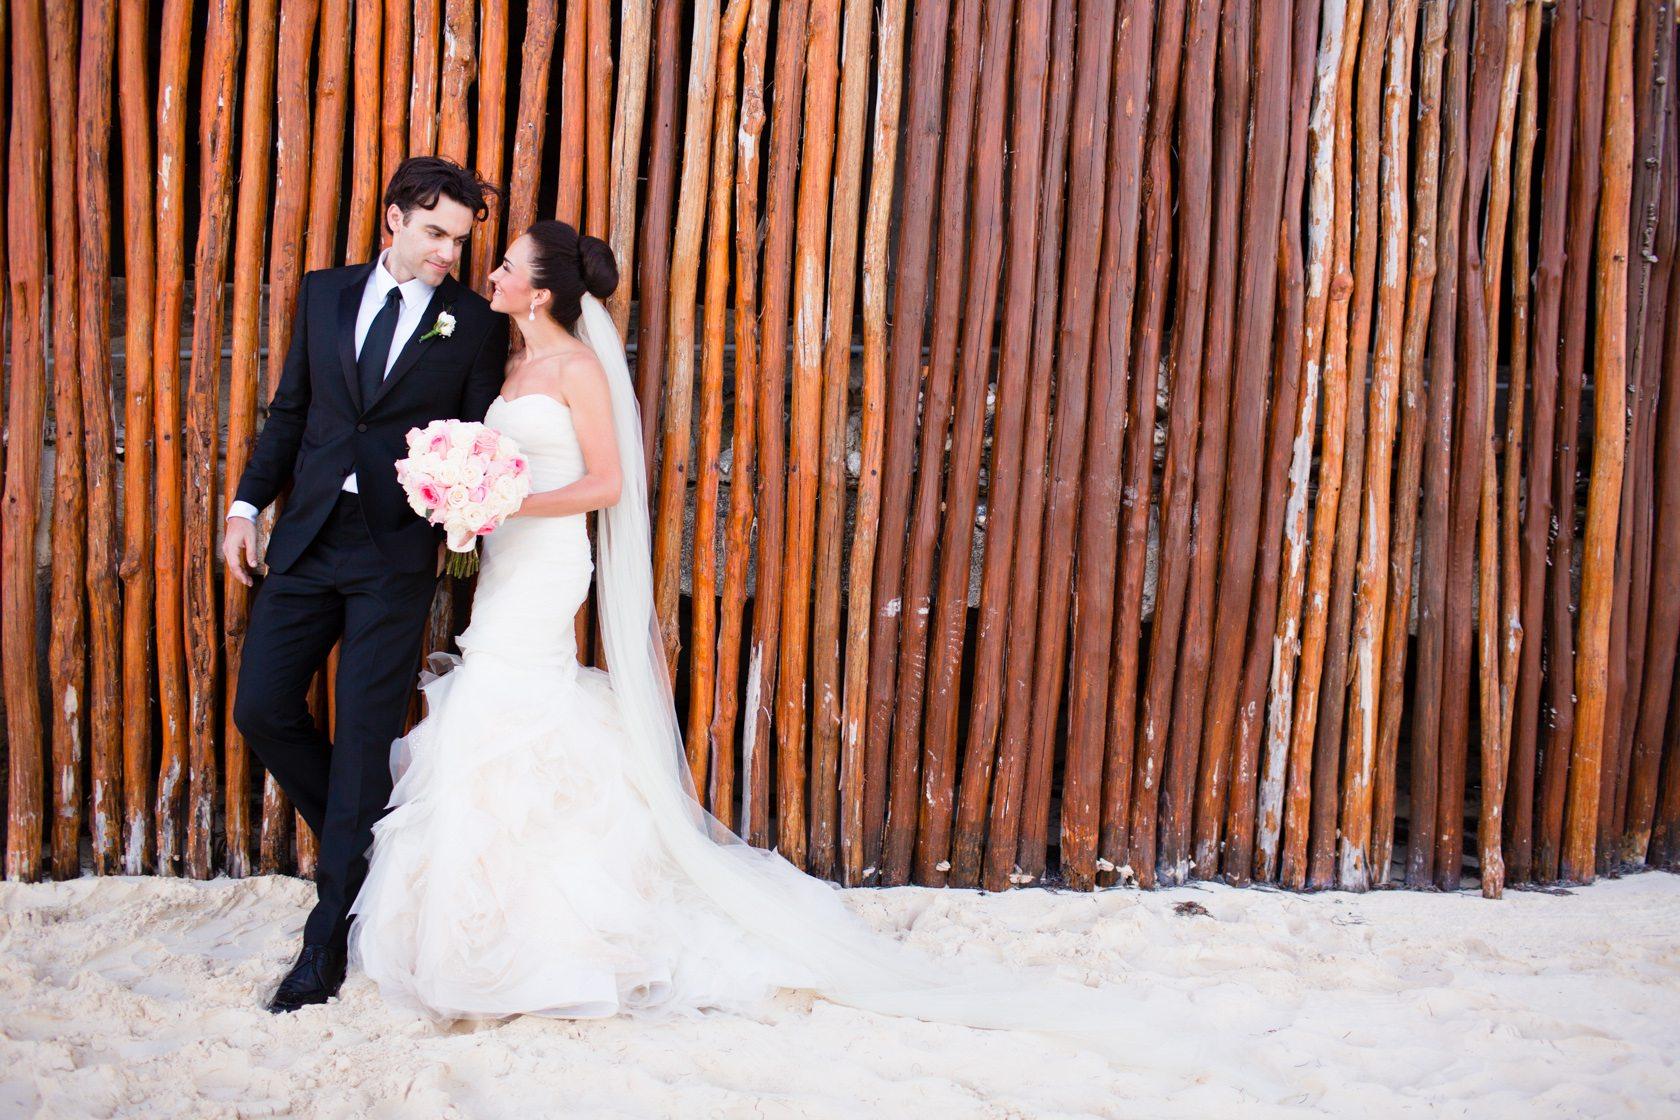 Fairmont_Mayakoba_Wedding_076.jpg